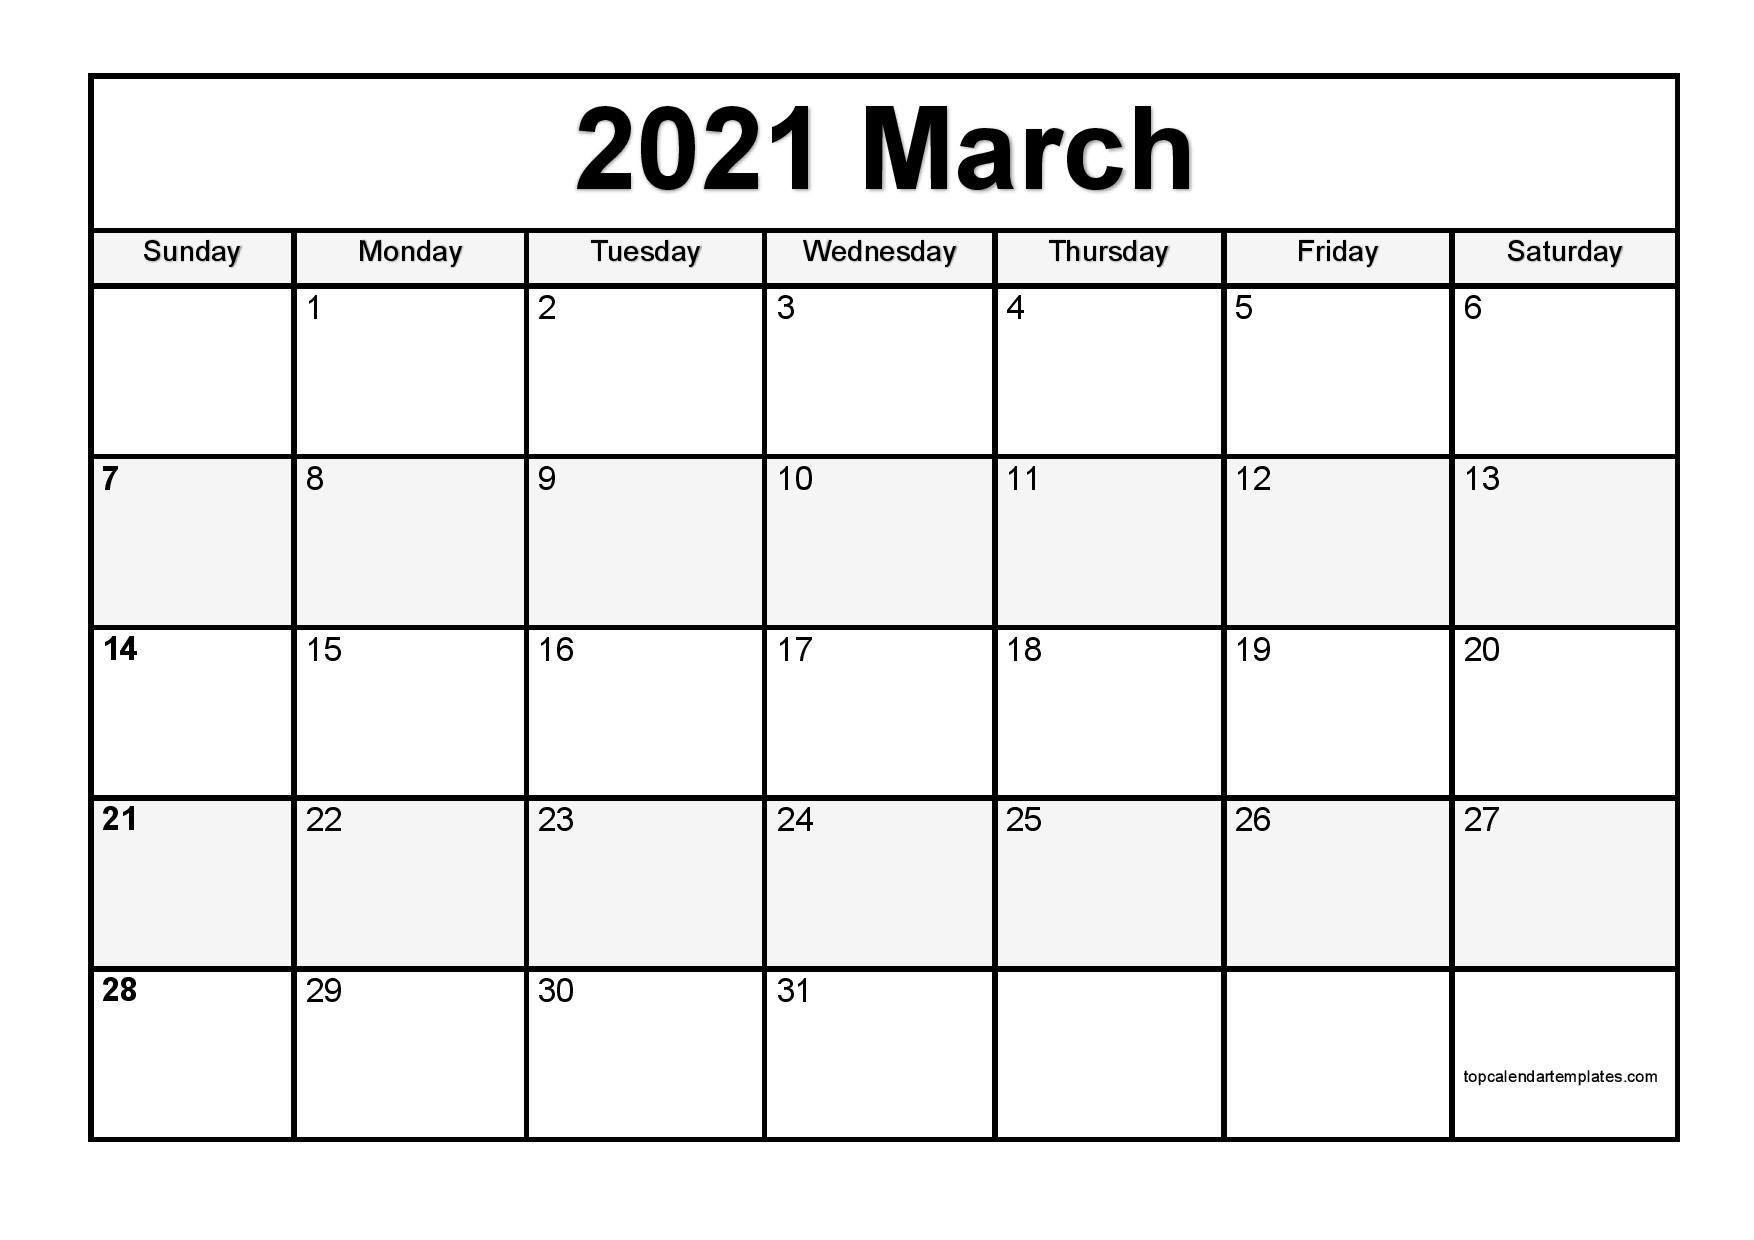 Free March 2021 Printable Calendar in Editable Format